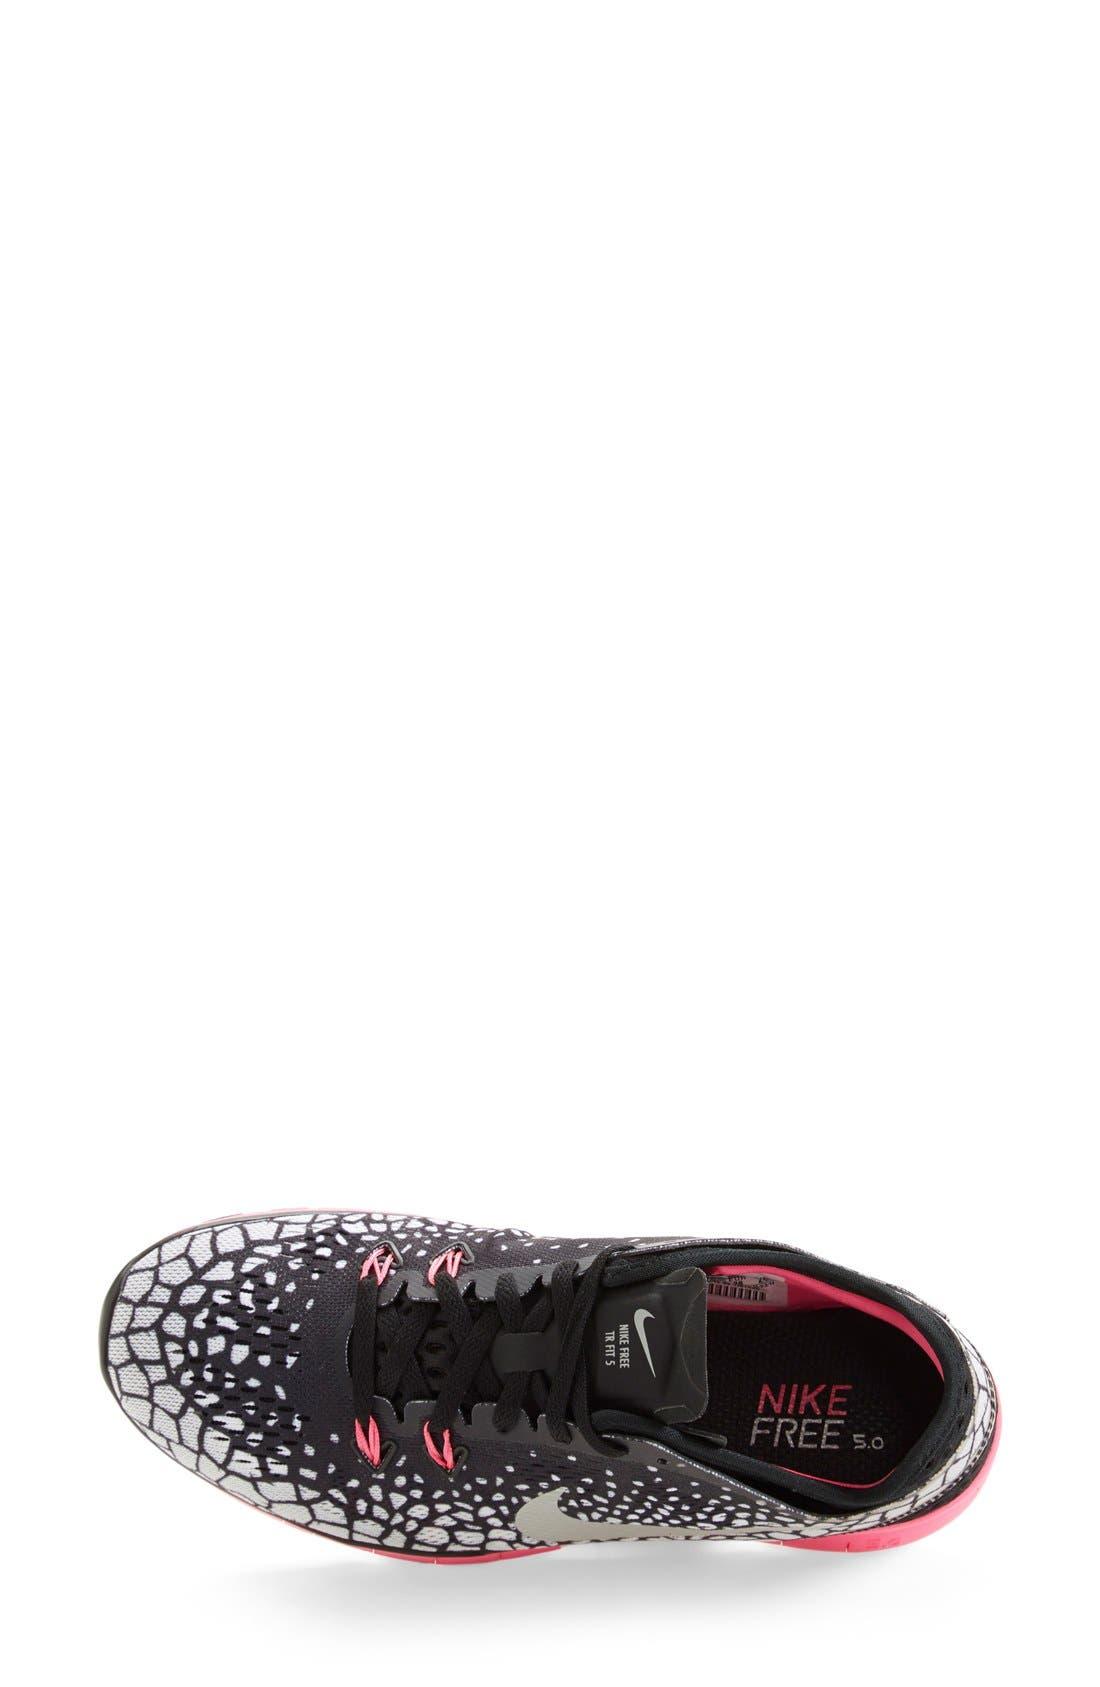 Alternate Image 3  - Nike 'Free 5.0 TR Fit 5 Print' Training Shoe (Women)